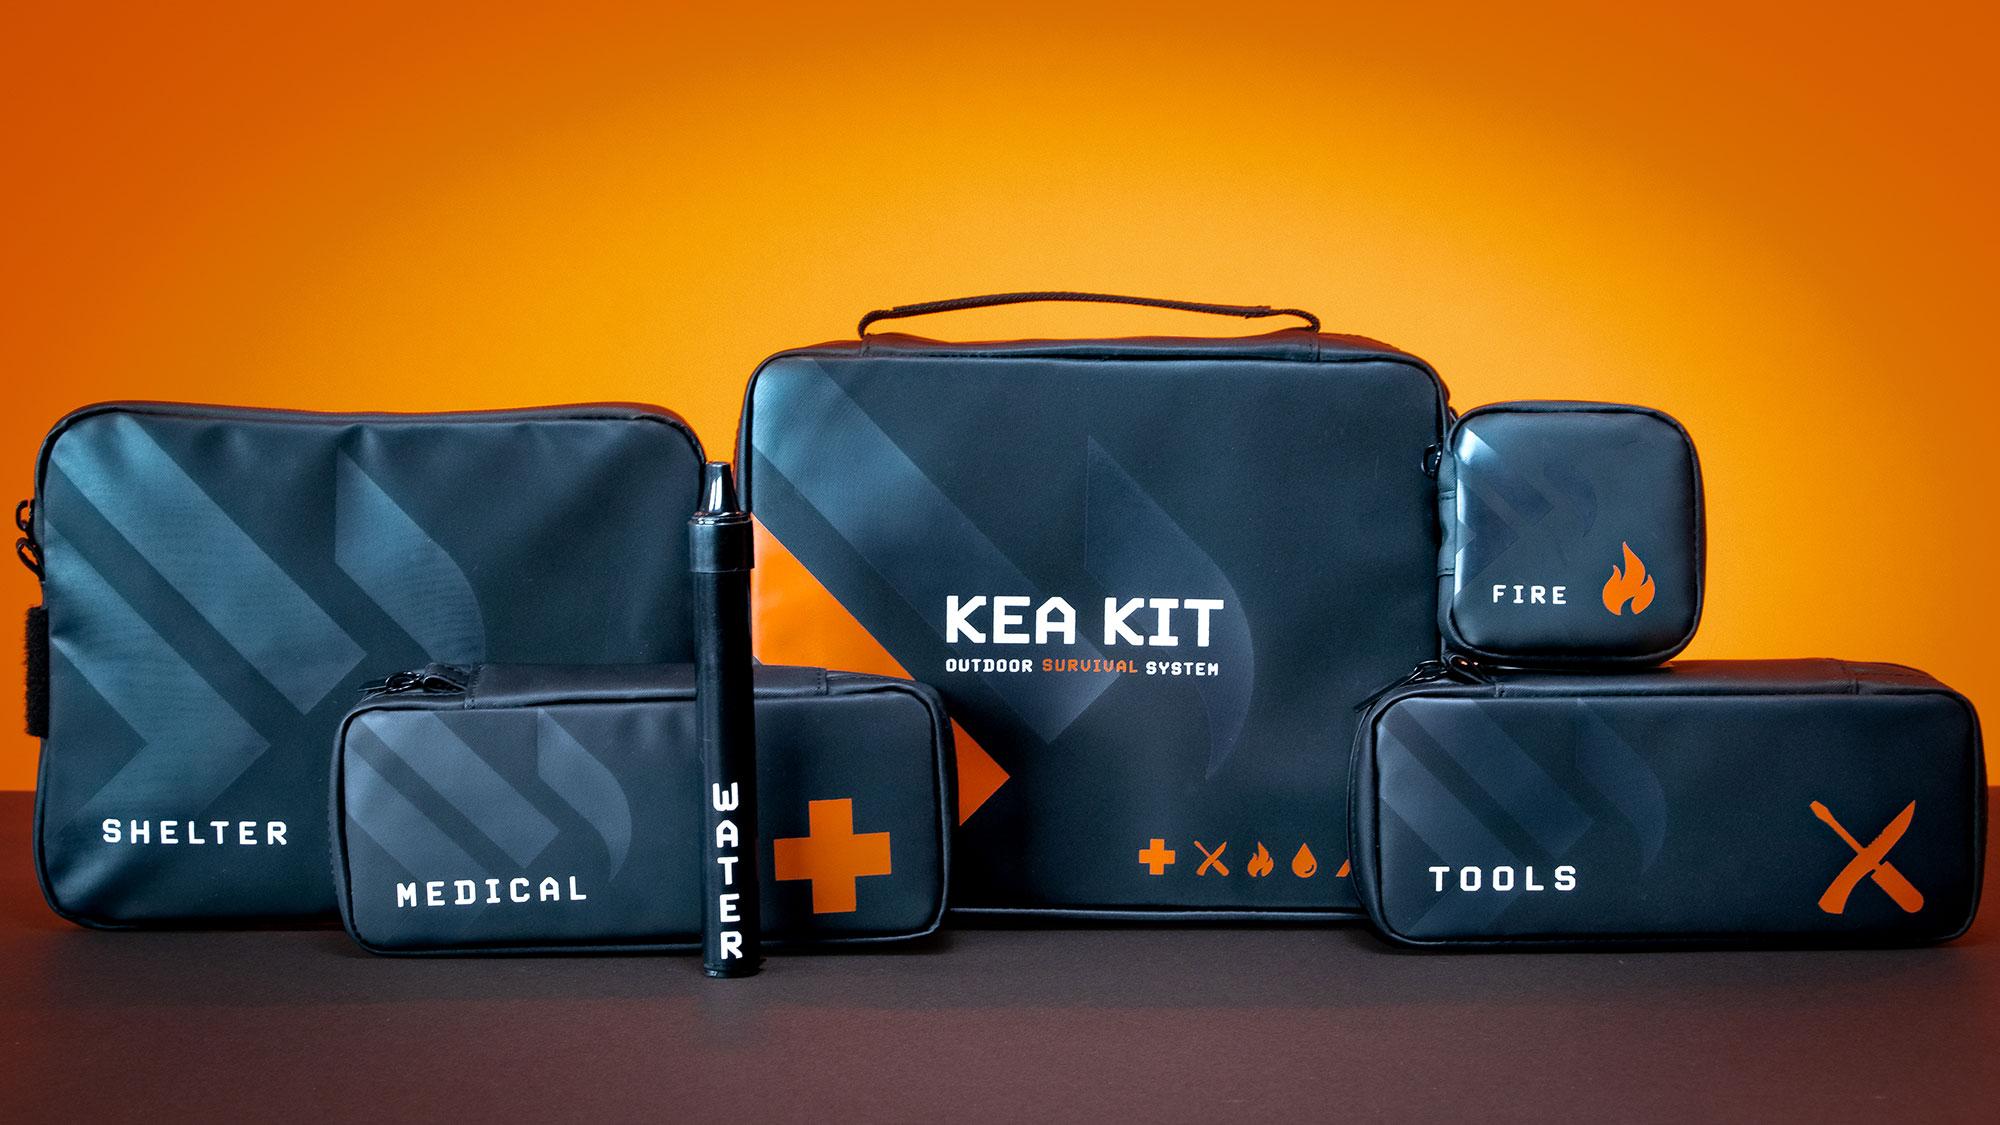 KEA Kit Outdoor Survival System Kickstarter